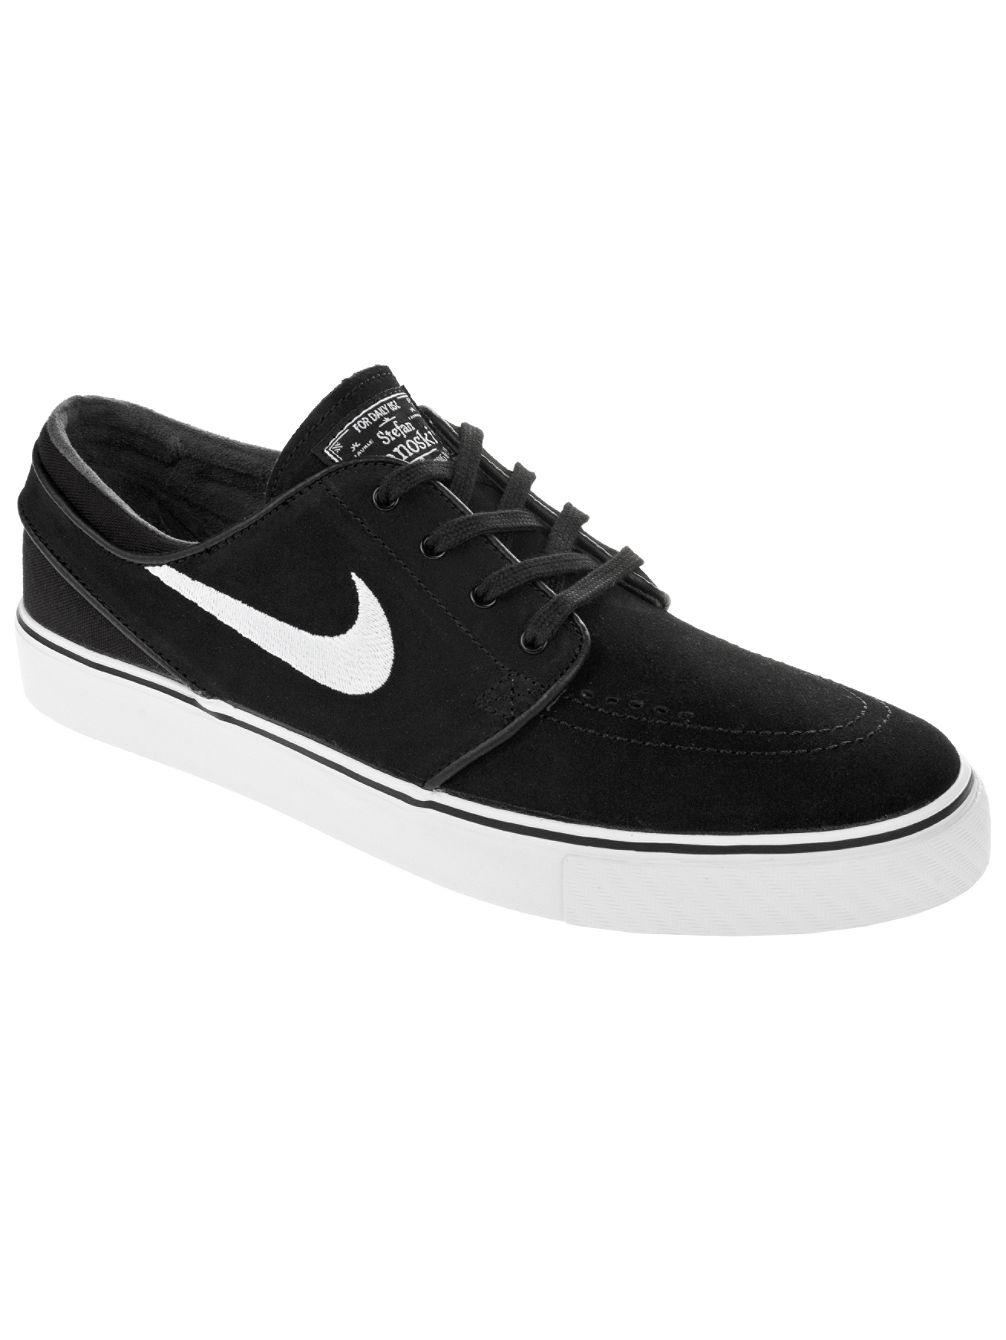 achetez nike zoom stefan janoski chaussures de skate en ligne sur blue. Black Bedroom Furniture Sets. Home Design Ideas